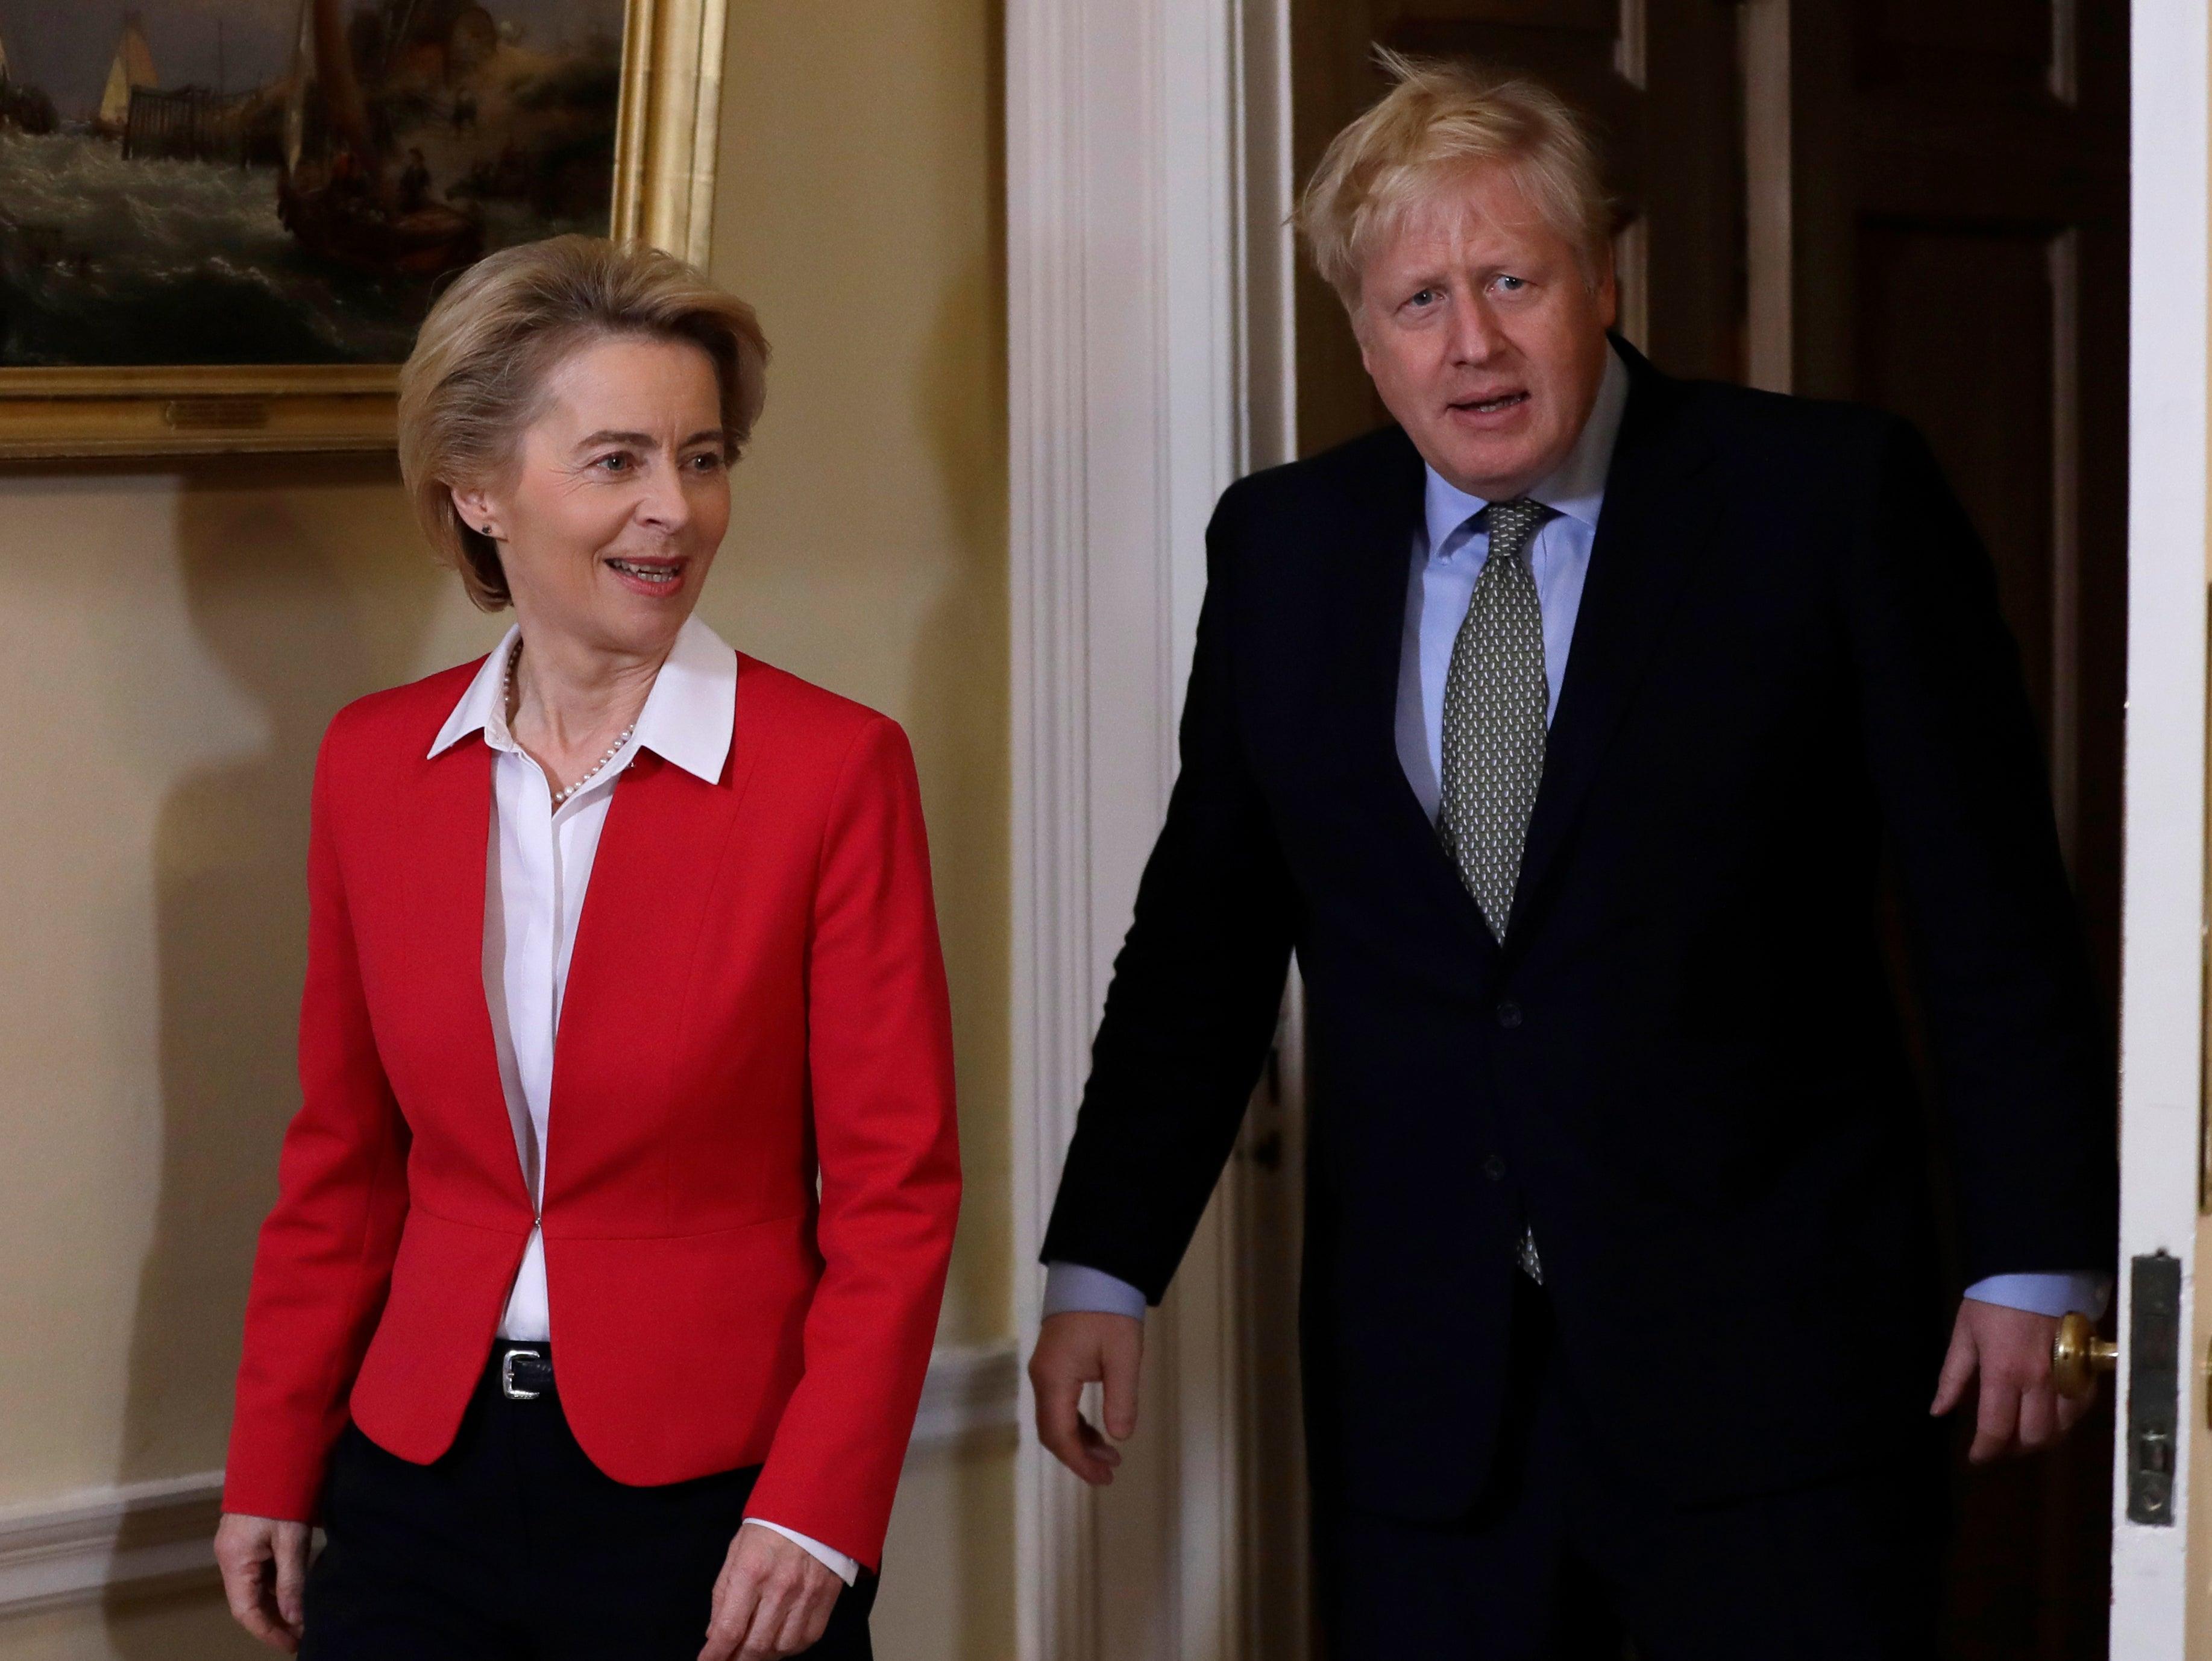 Image Inside Politics: Boris Johnson set for showdown meeting in Brussels